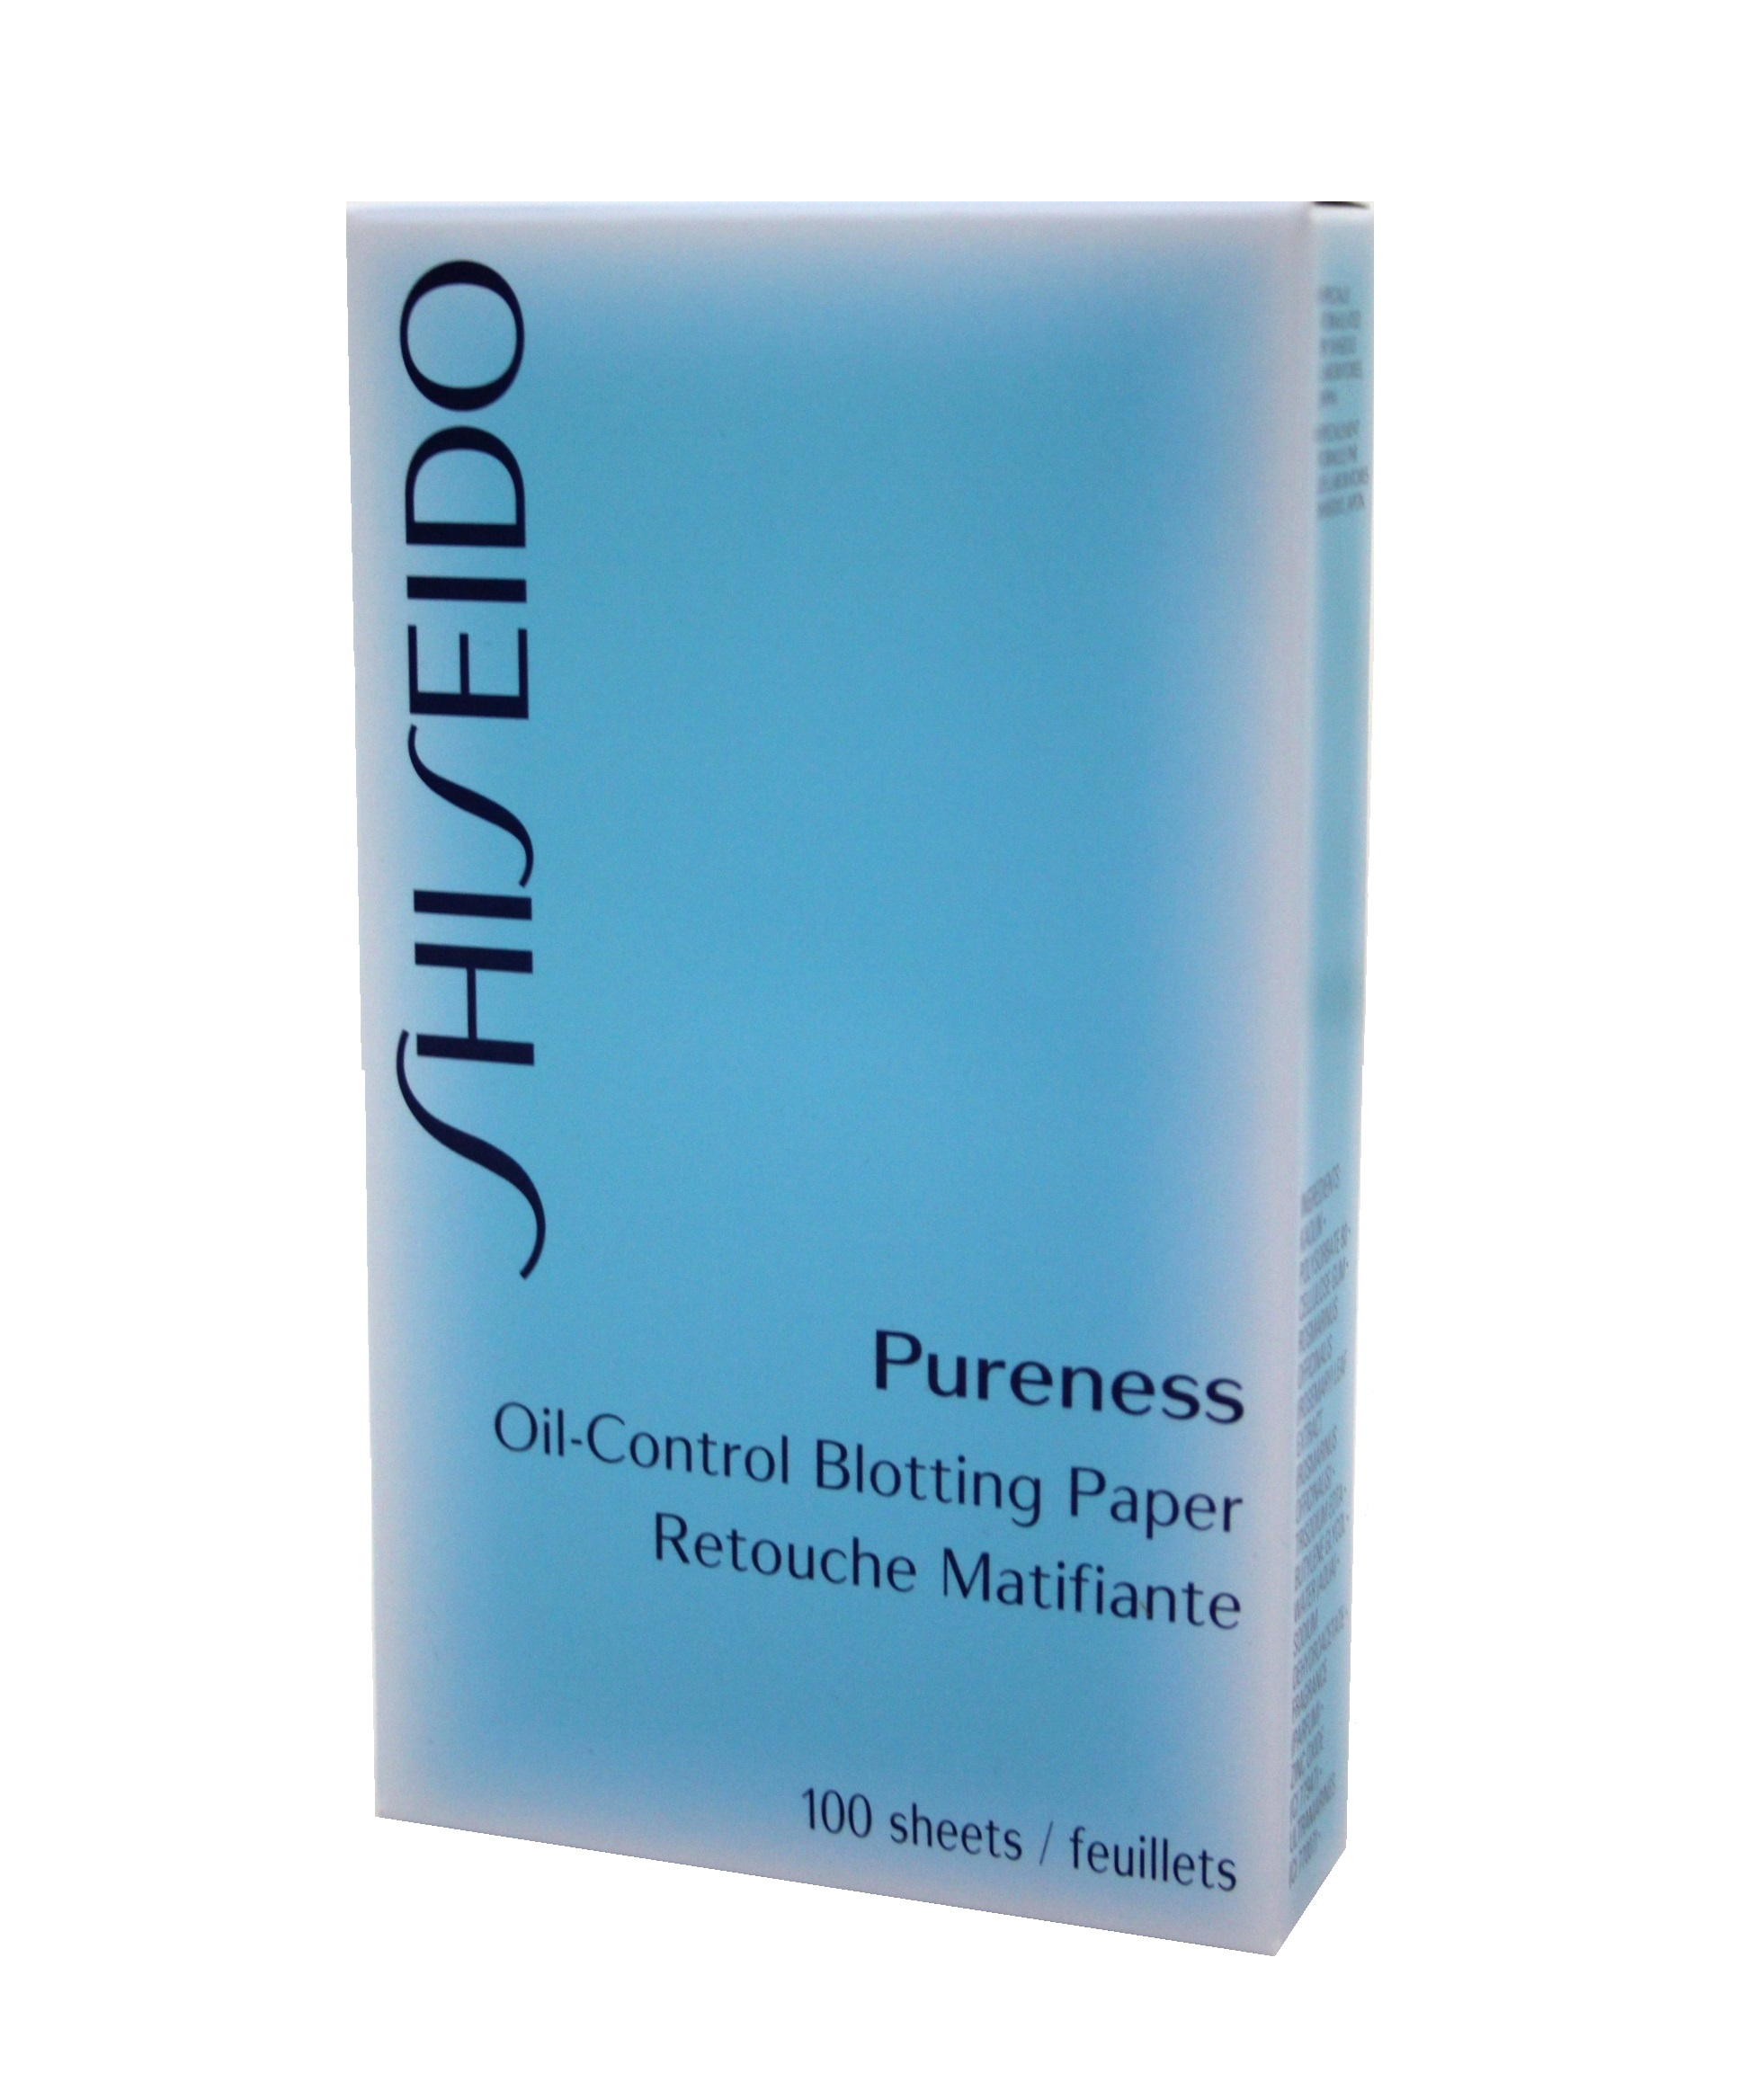 Shiseido Oil - Control Blotting Paper